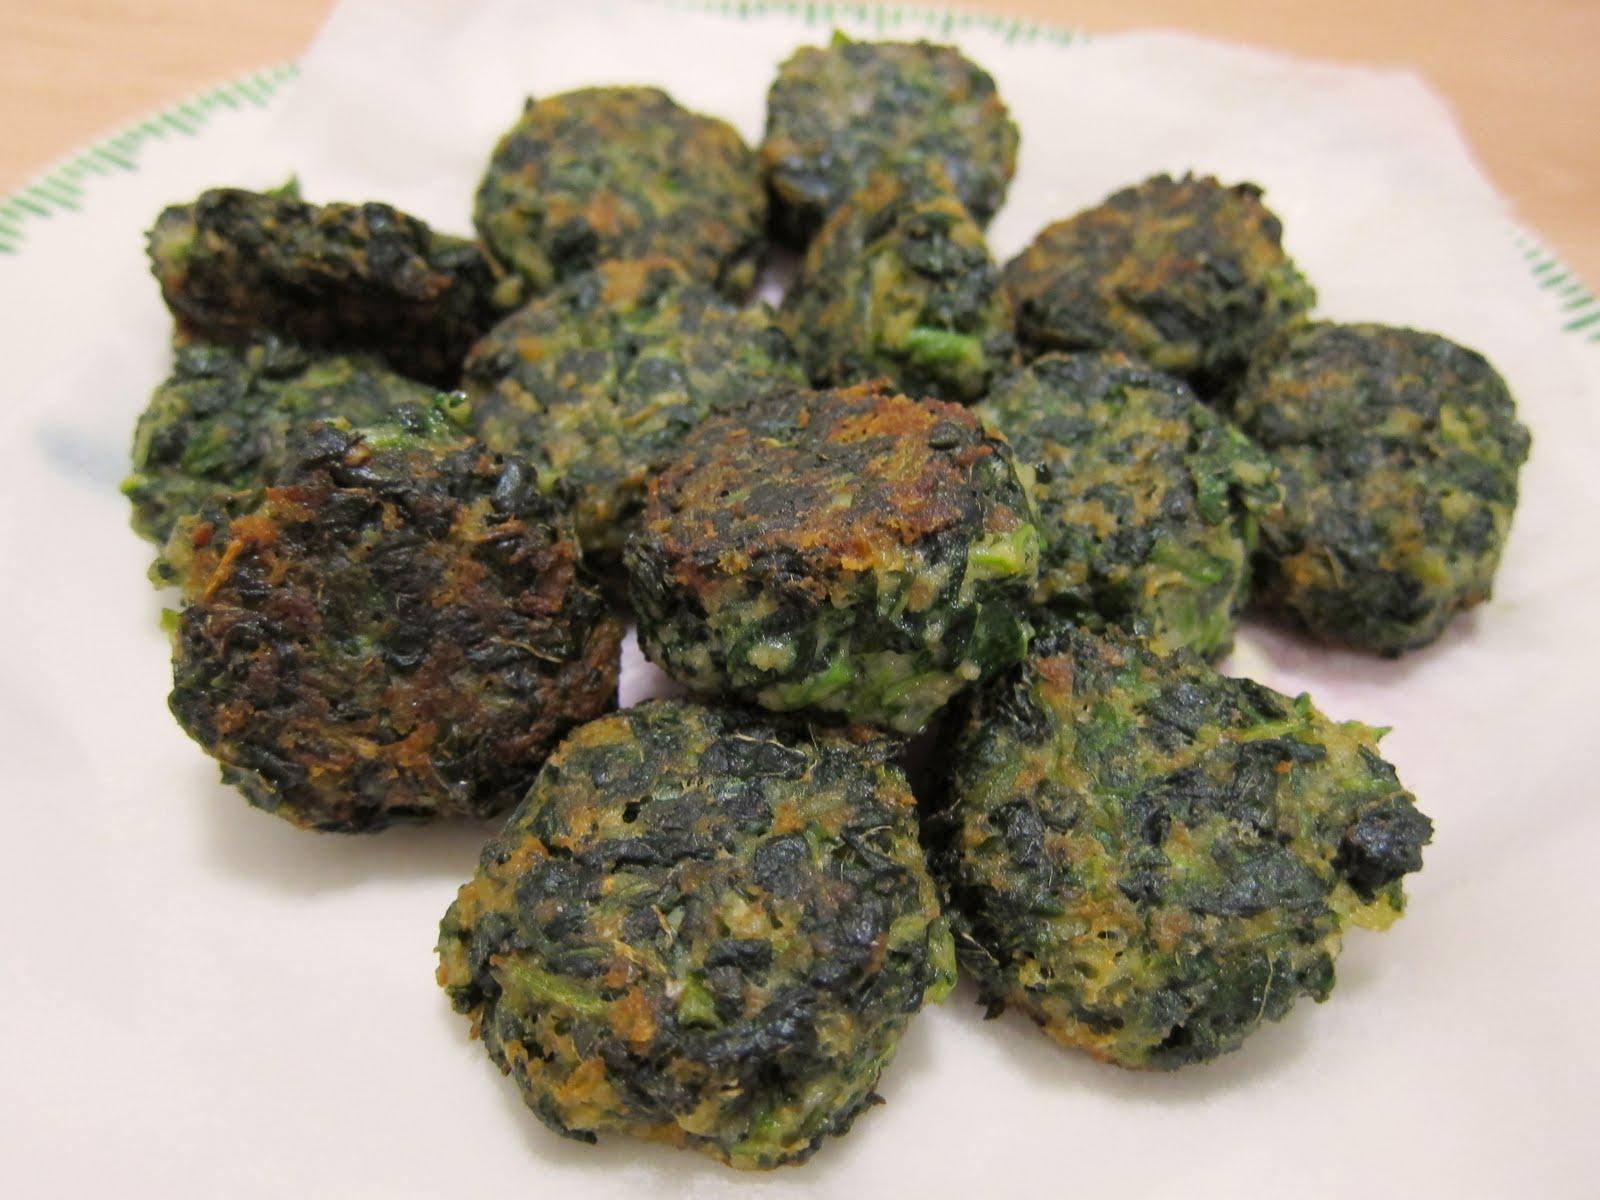 Kitchen comforts: Polpettine di Spinaci (Spinach Balls)